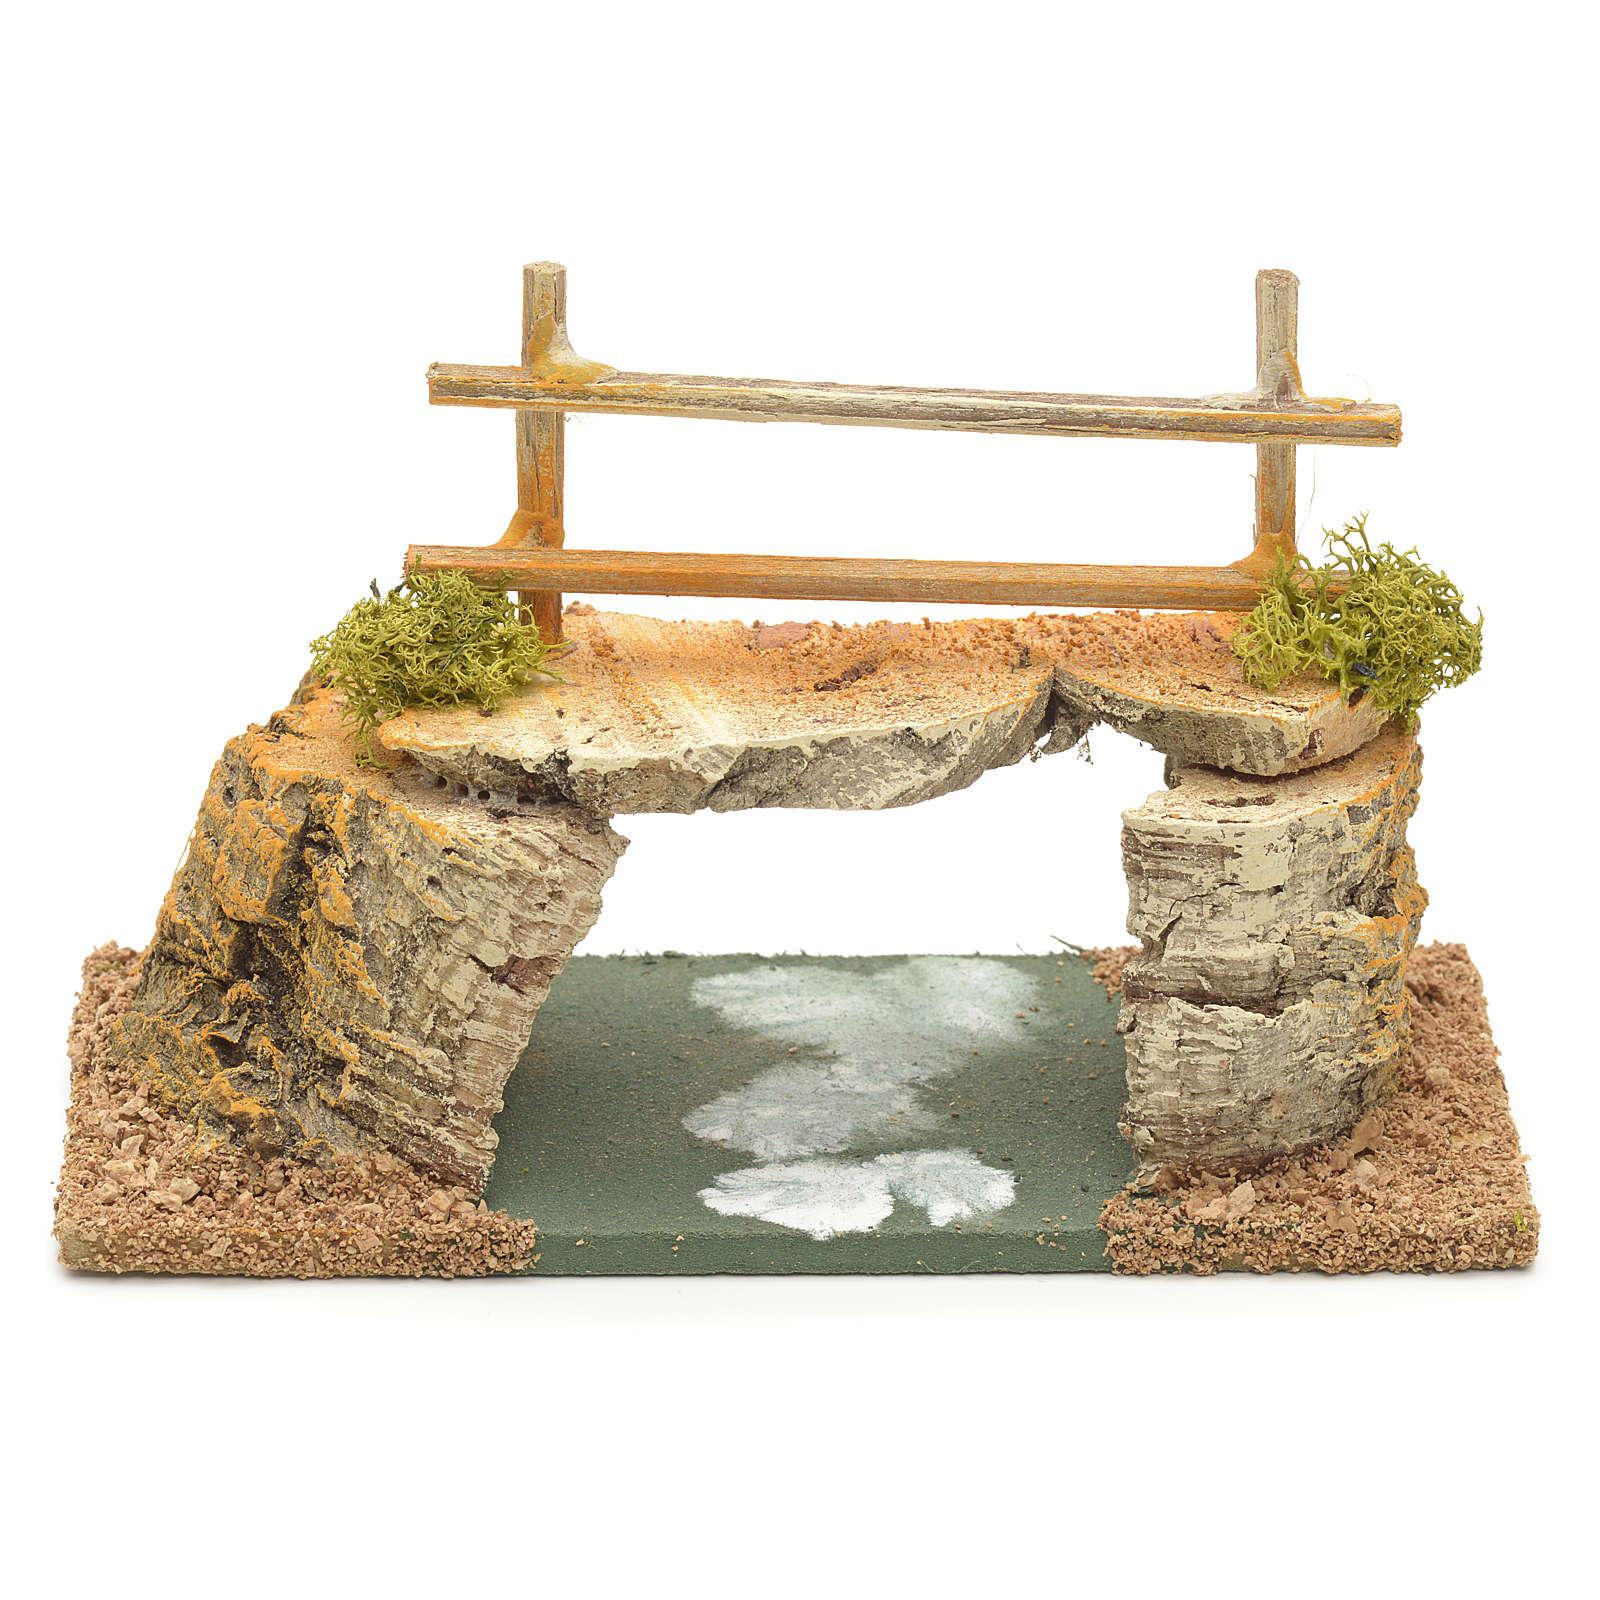 Pont liège pour crèche 8x15x7cm 4